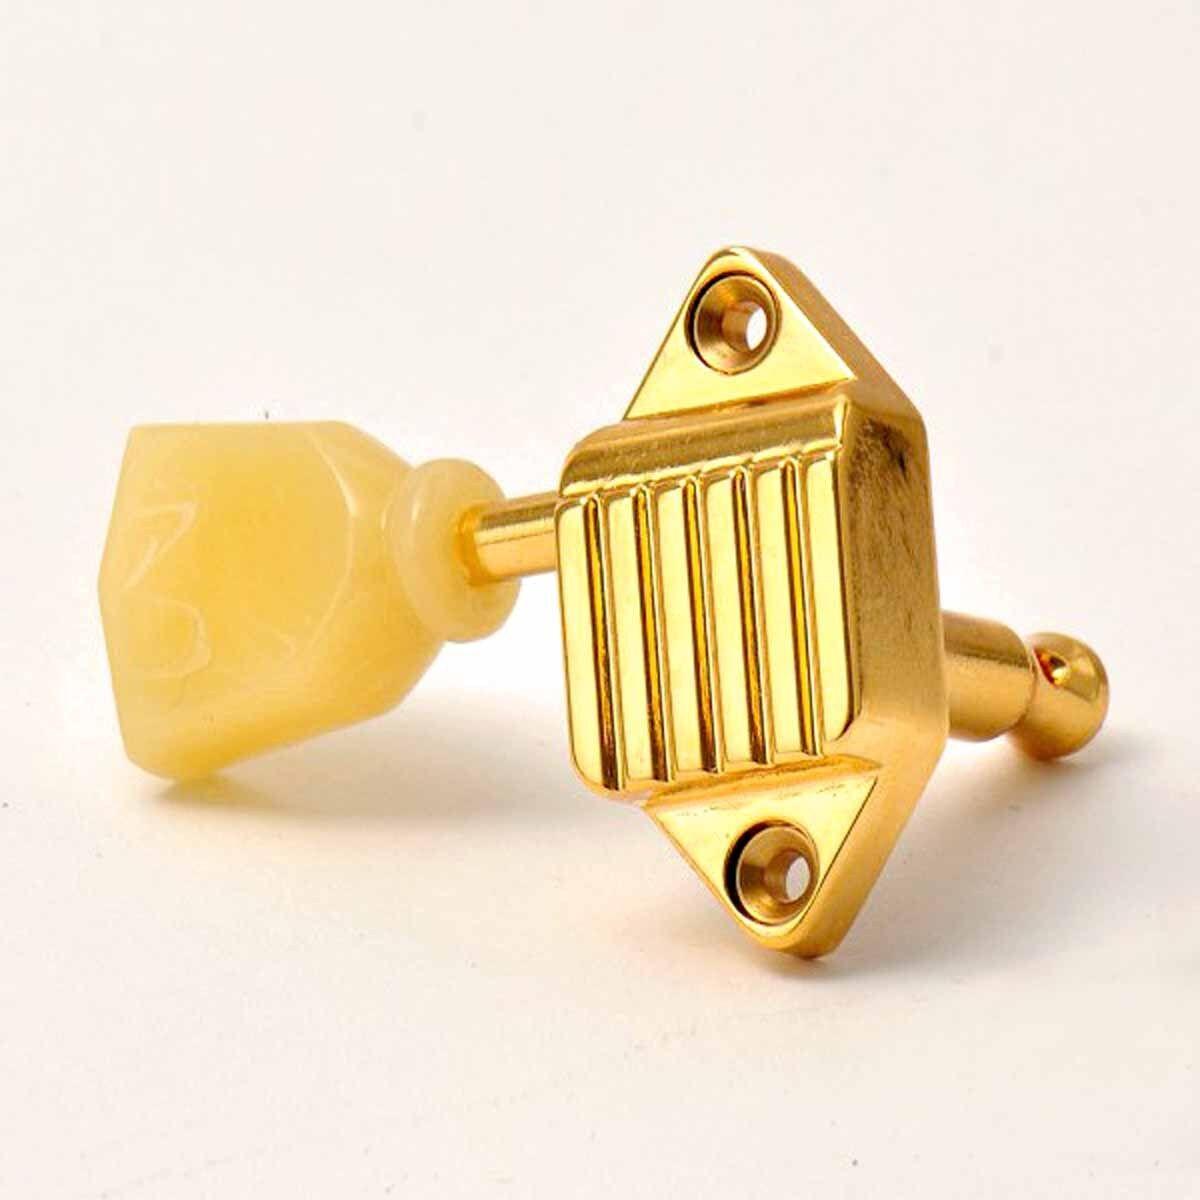 garanzia di qualità Mecaniques Mecaniques Mecaniques Waffleback 3L3R Vintage Kluson oroo oro Tuners 18 1 Keystone Pearl  risparmia fino al 50%